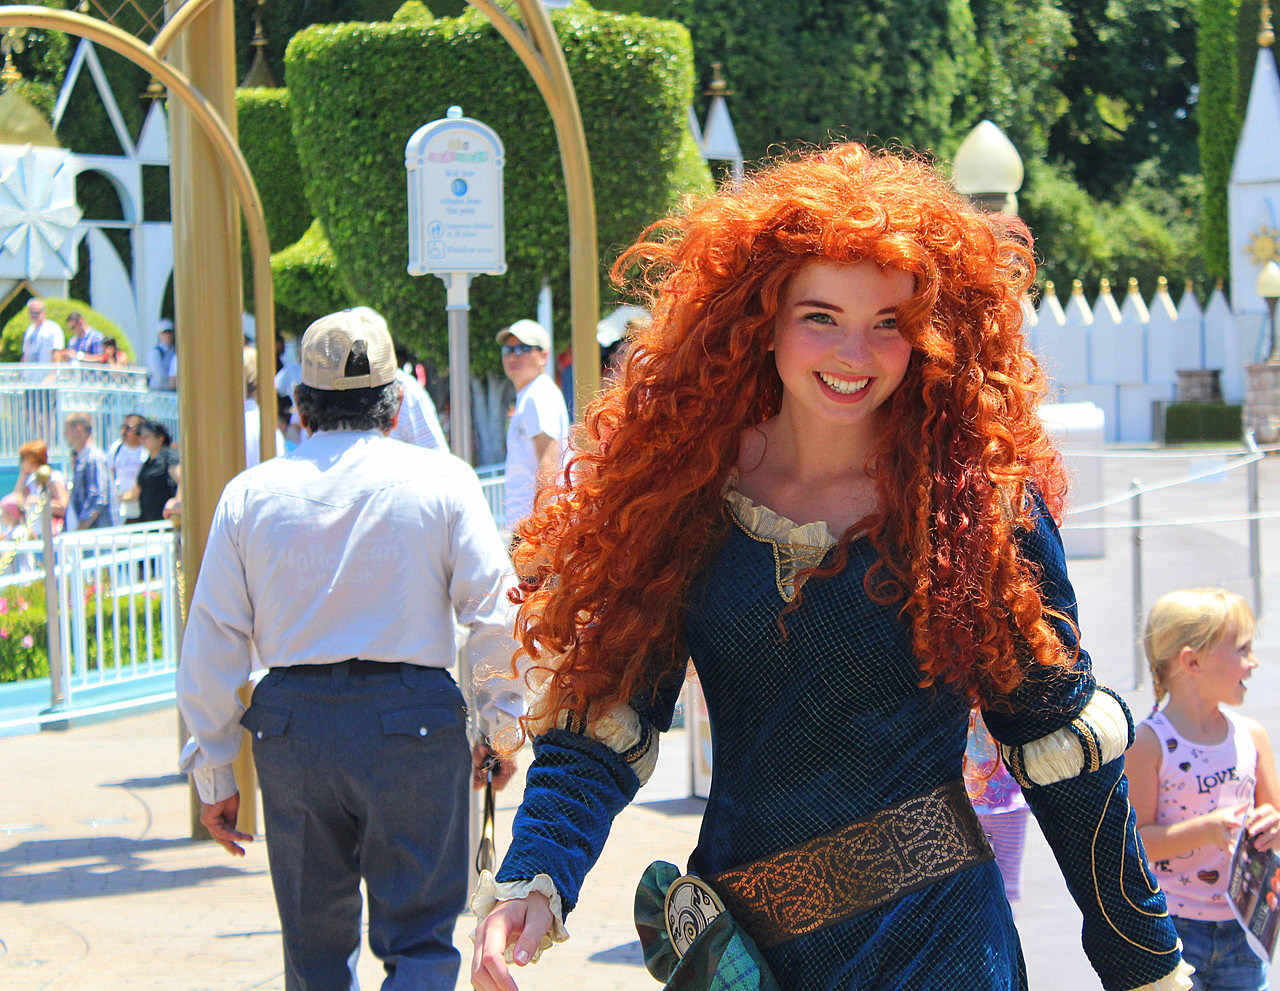 Disneyland s princess merida looks just like the real thing